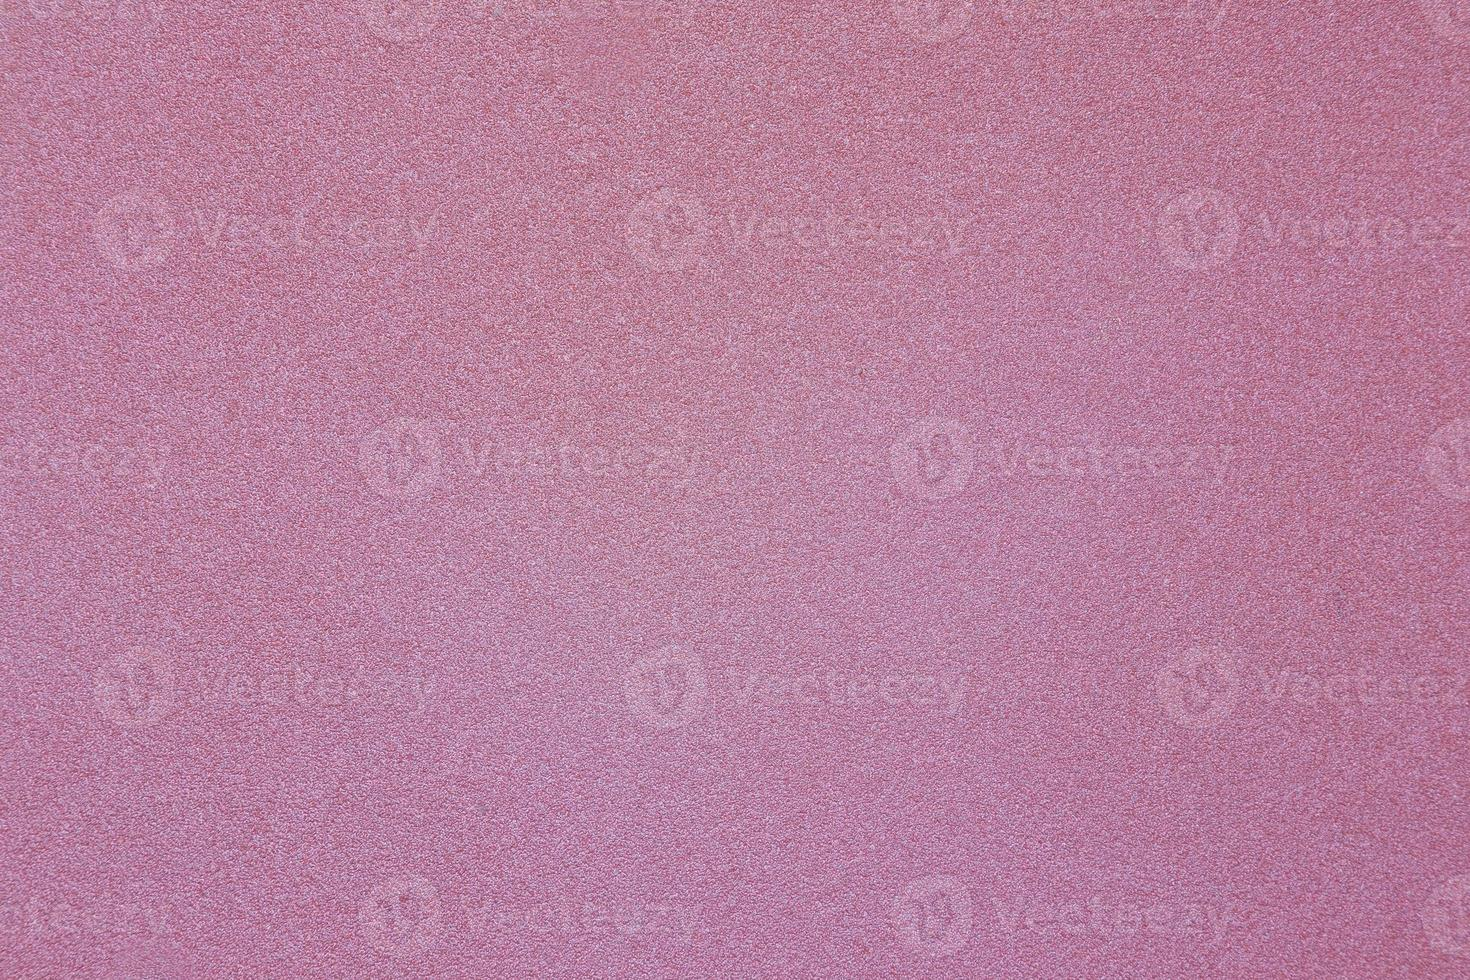 Sandpaper texture photo